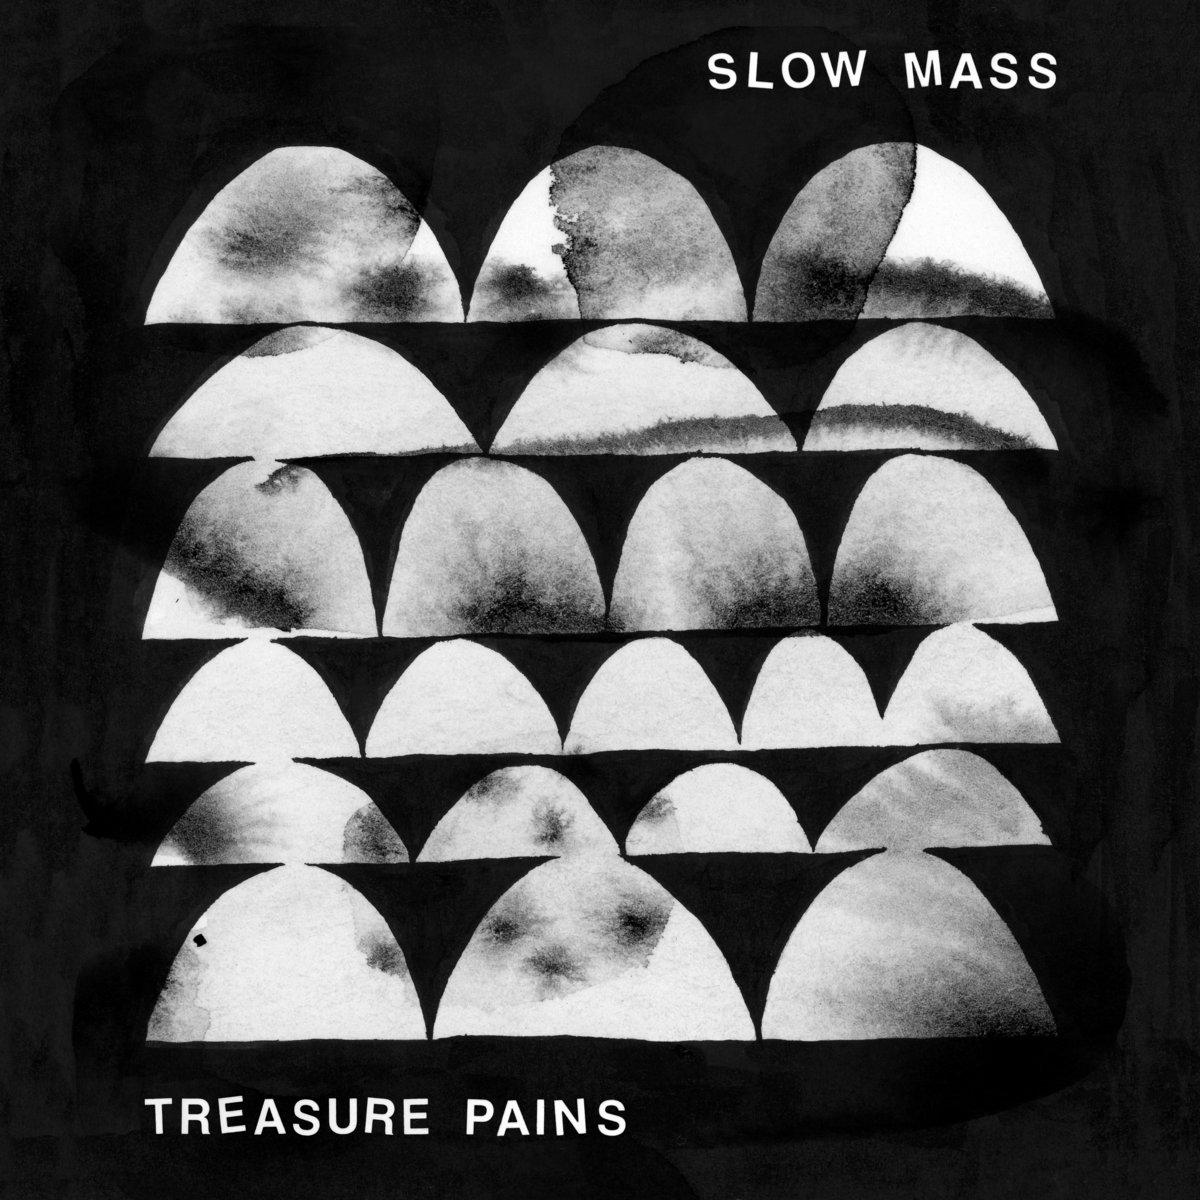 「slow mass」の画像検索結果